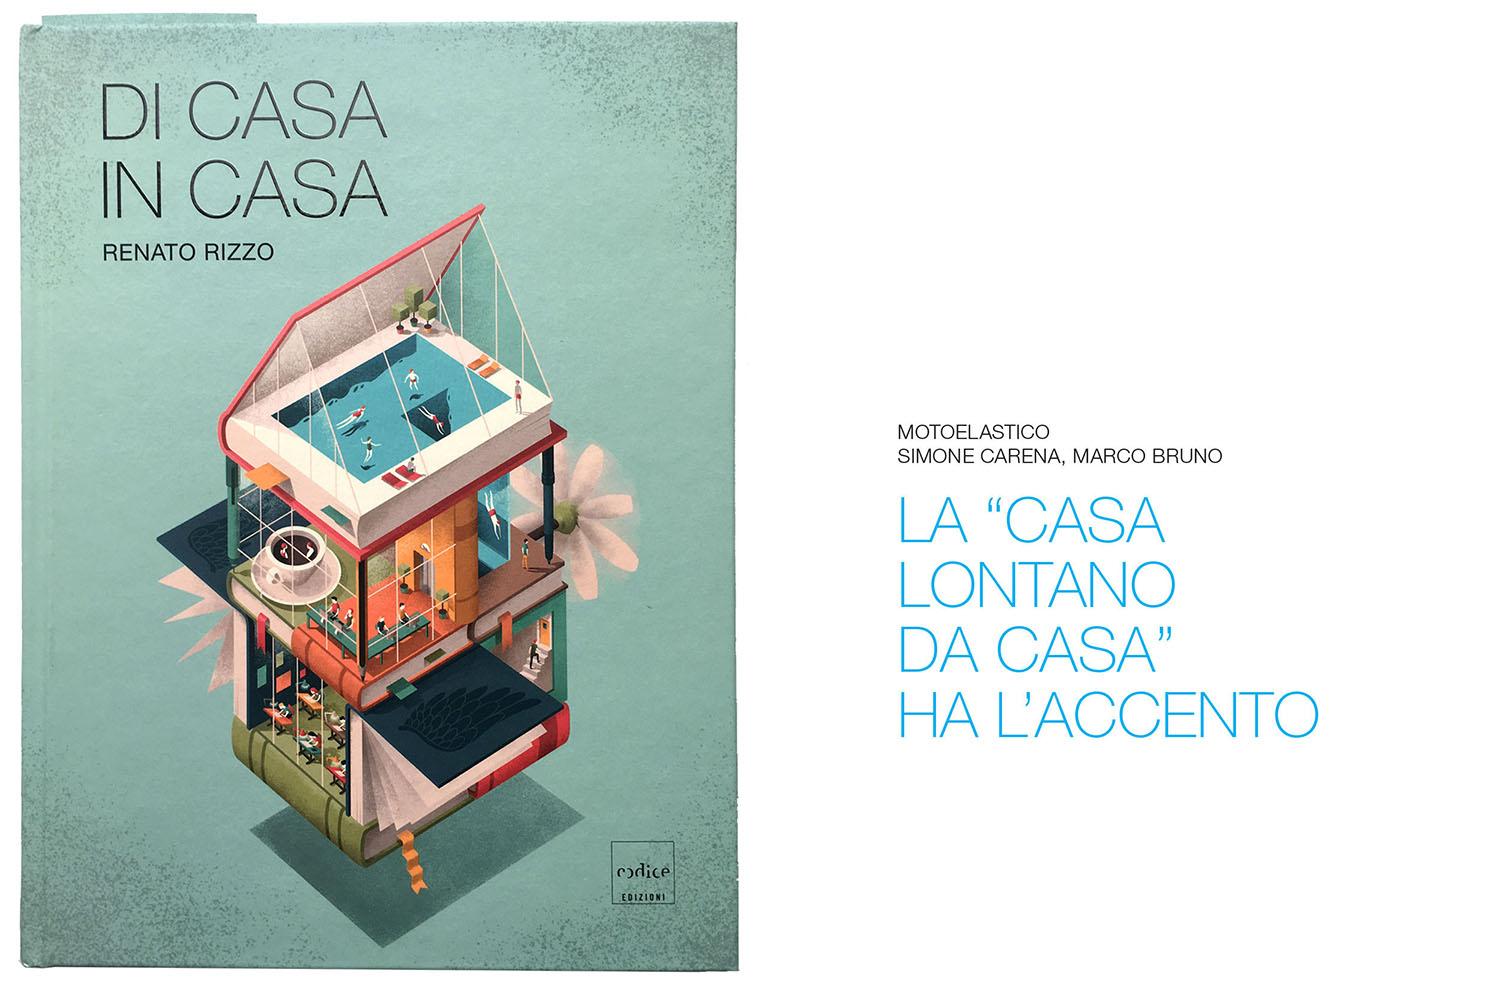 DI CASA IN CASA motonews.jpg